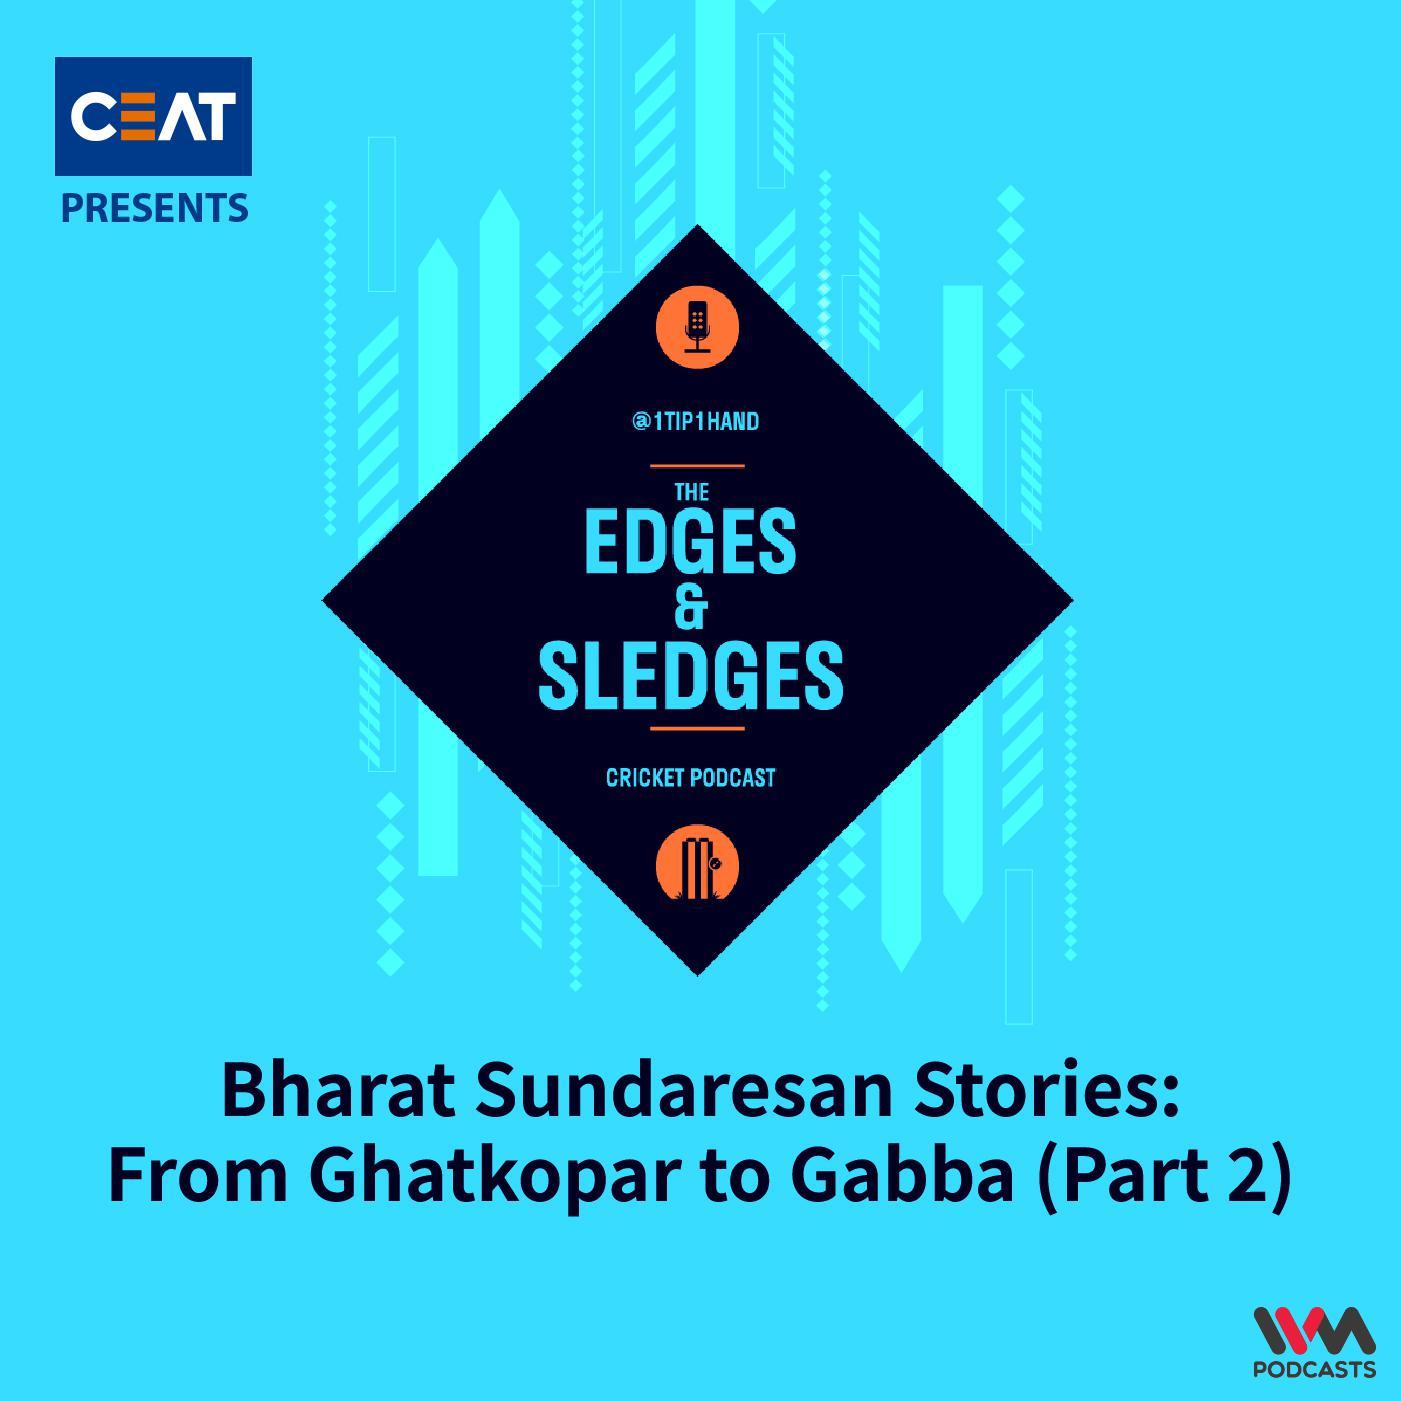 Ep. 176: Bharat Sundaresan Stories: From Ghatkopar to Gabba (Part 2)